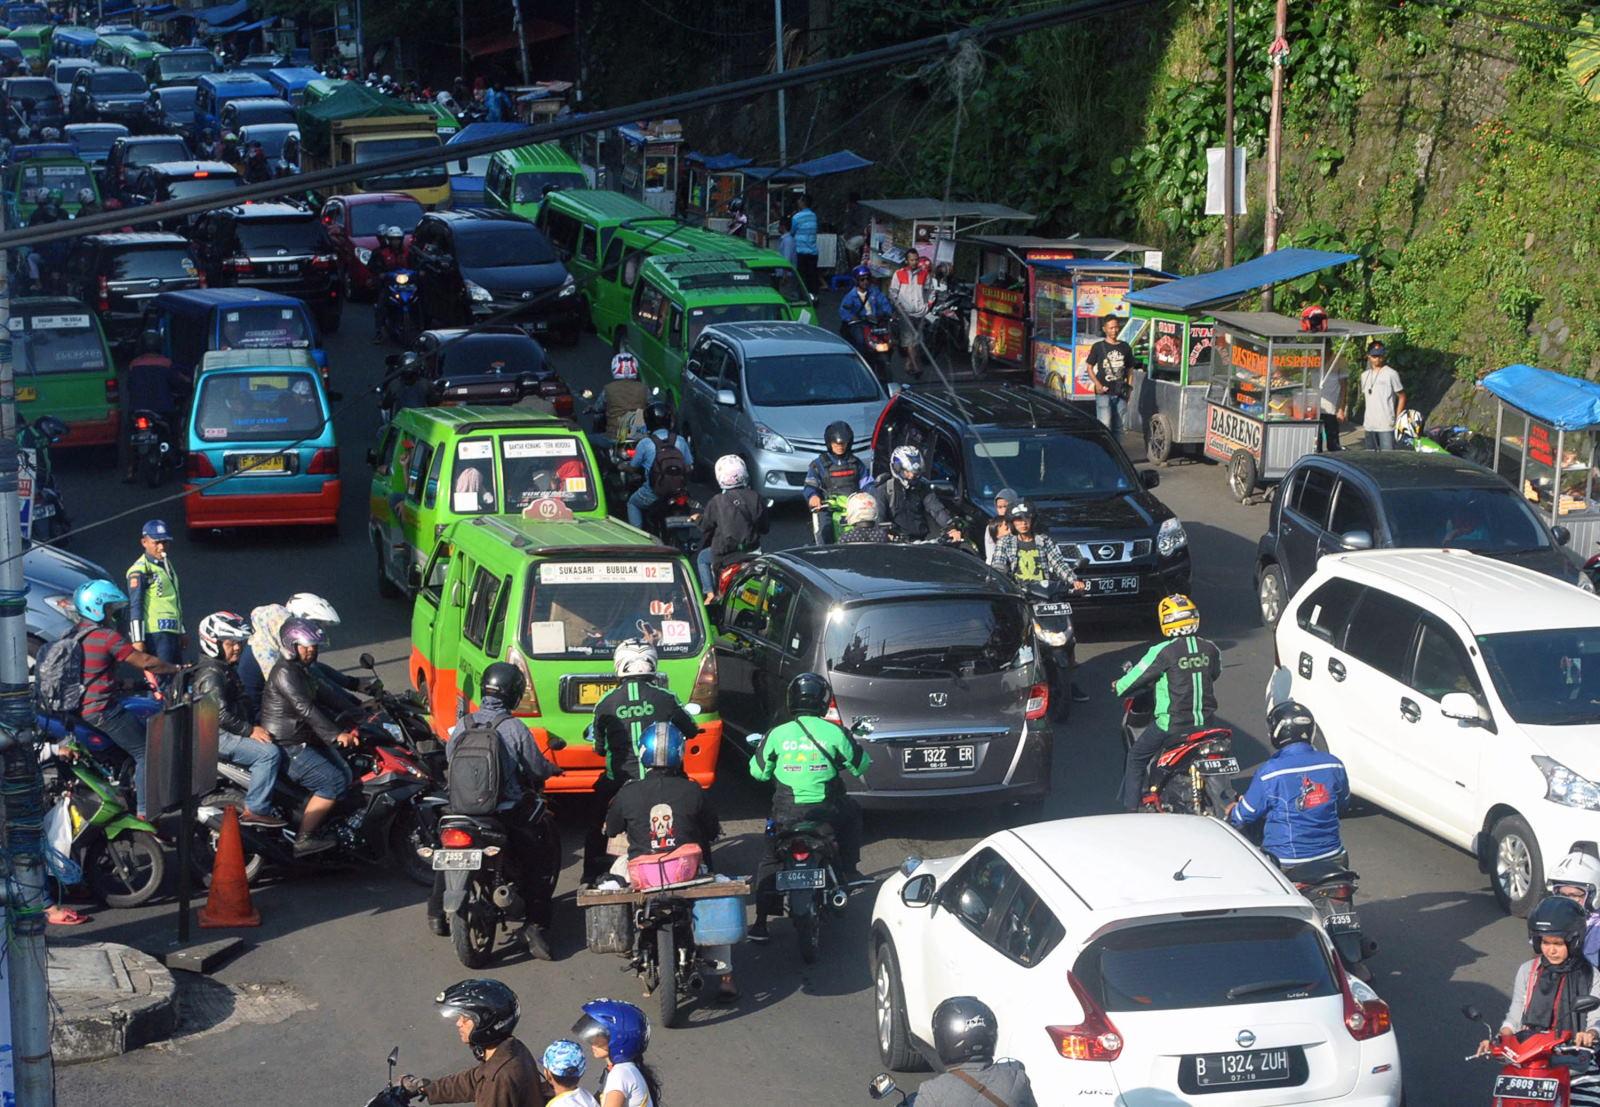 Rimba Jalanan Bogor dan Potret Buruk Transportasi Kota ...